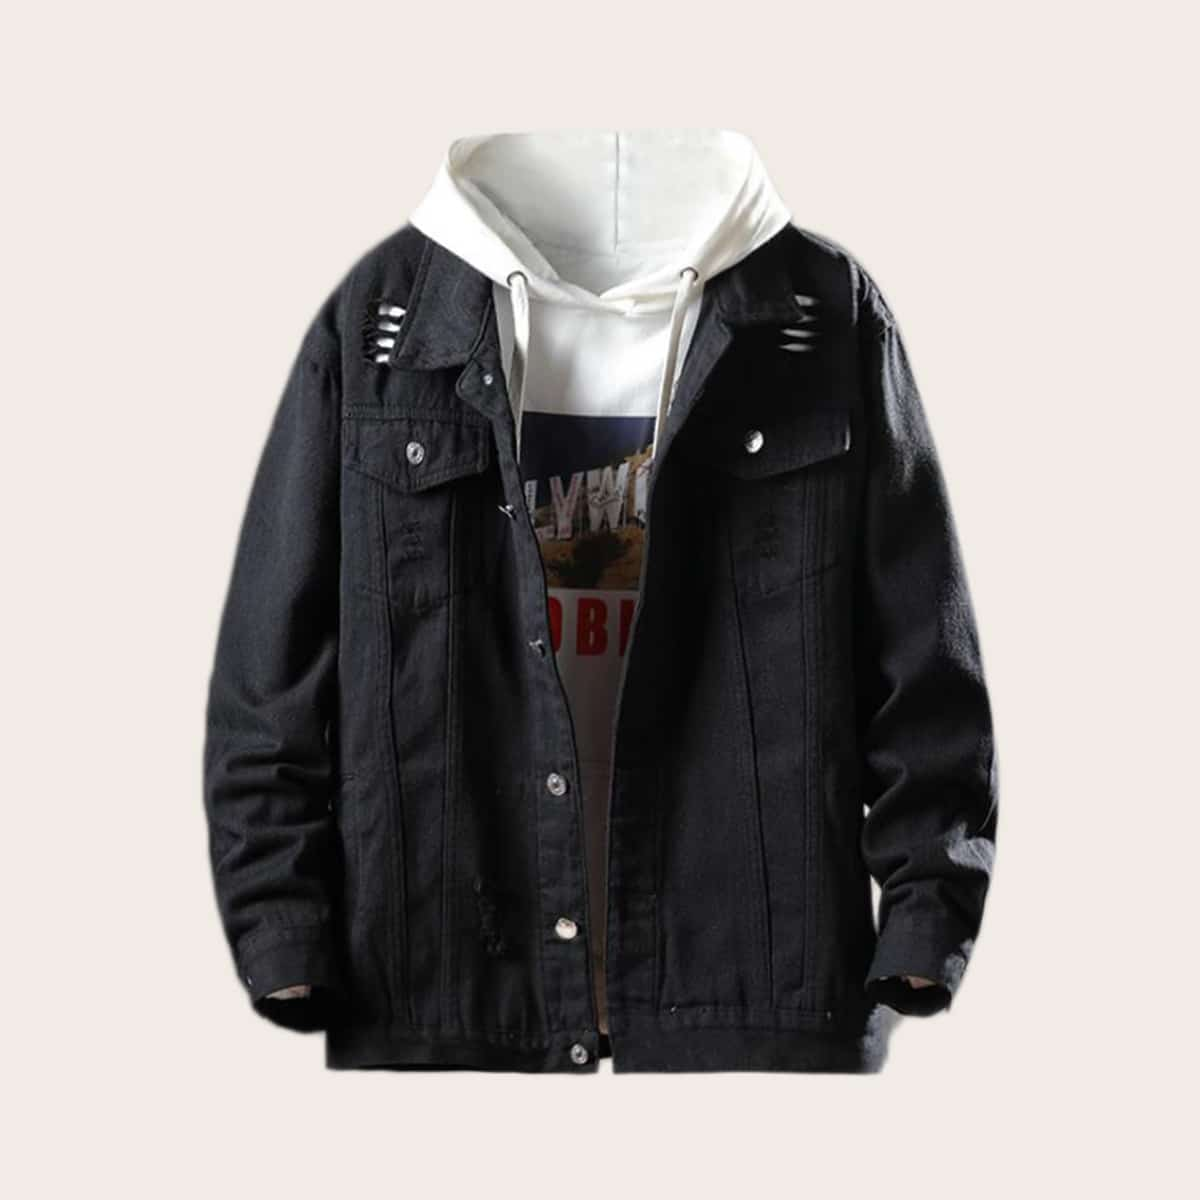 Zwart Casual Vlak Heren Jeans jassen Zak